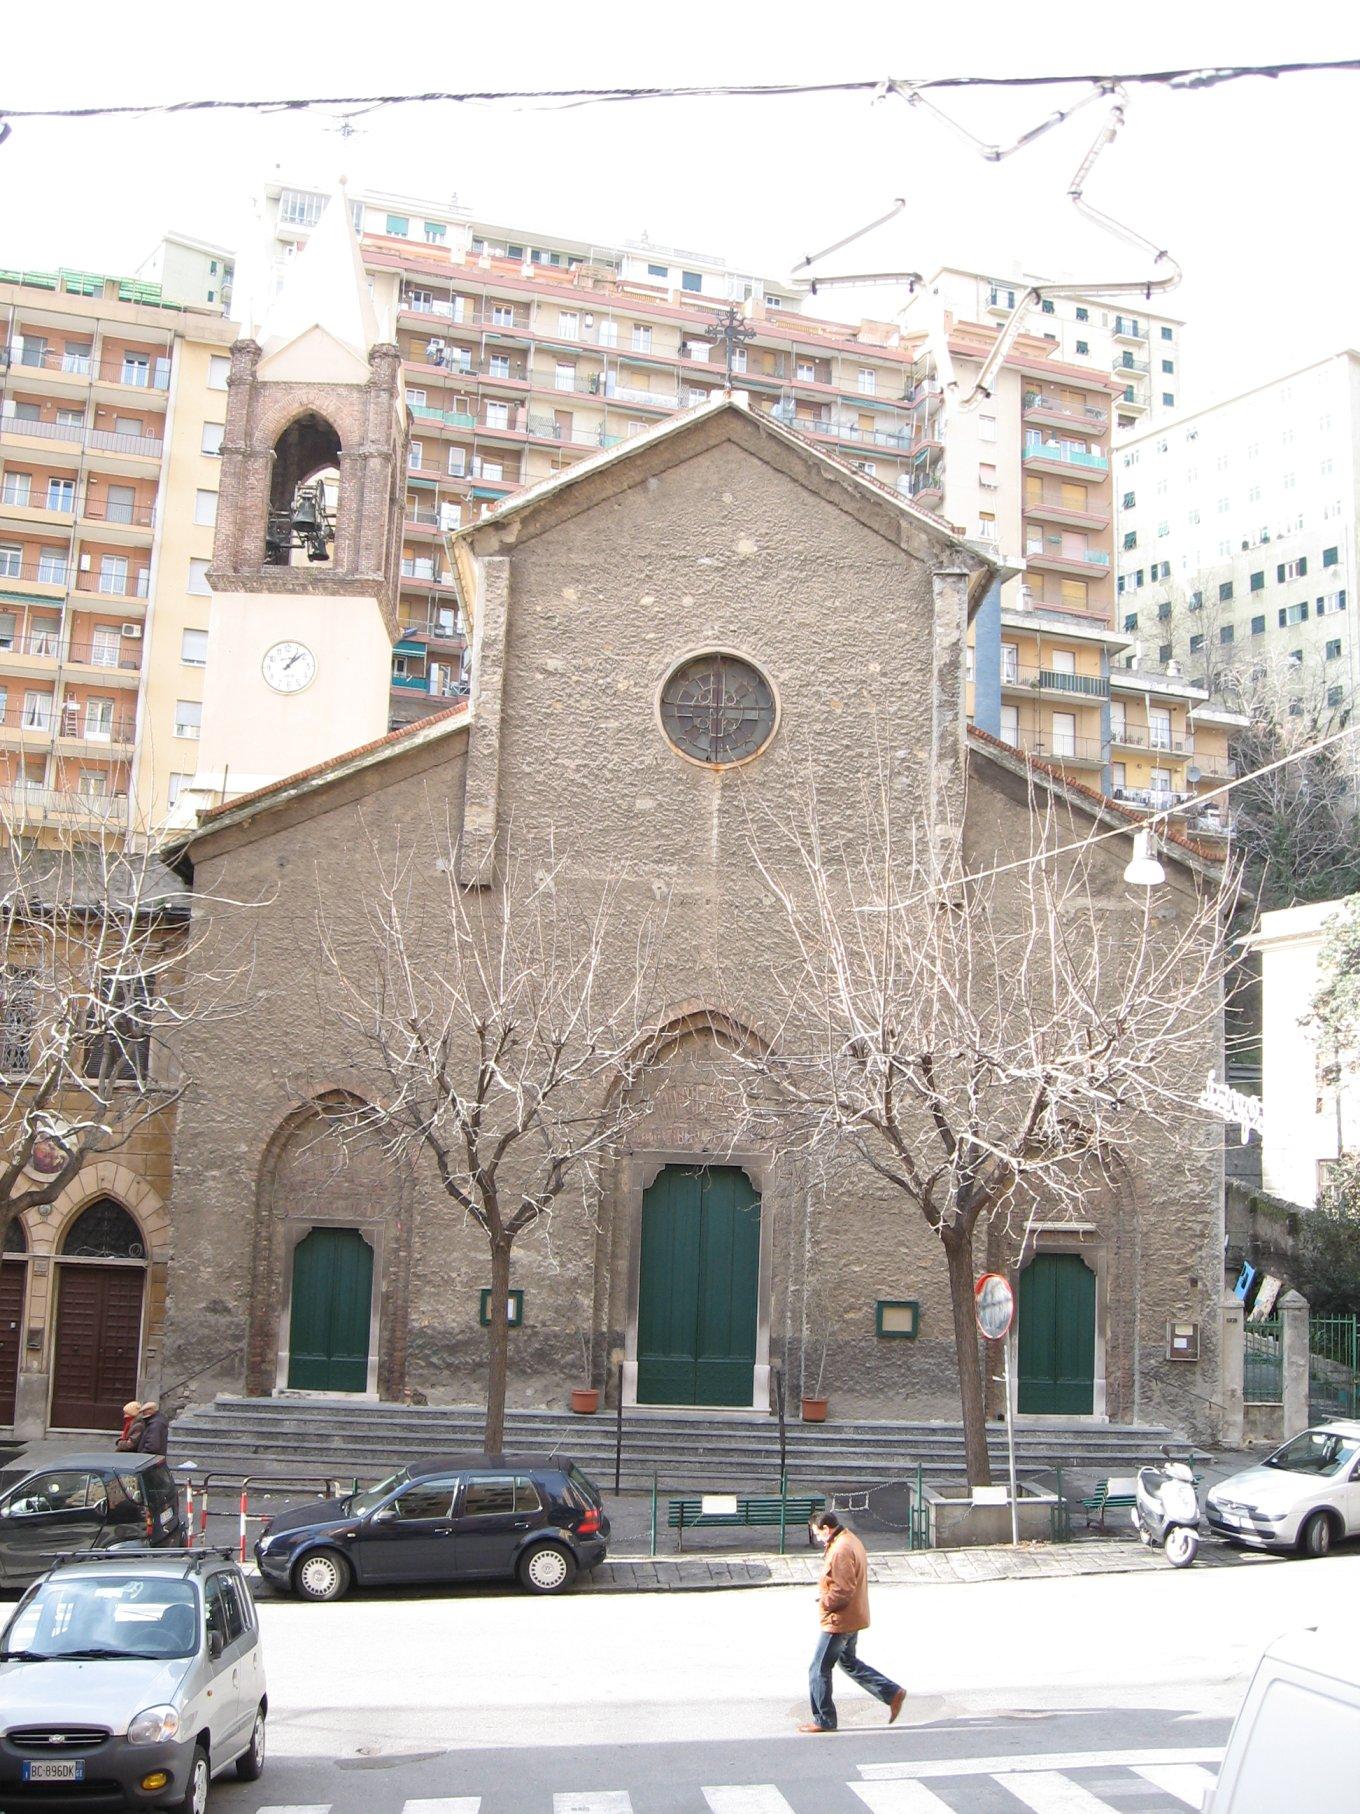 Chiesa_esterno-2009-01-27-13.09.20.jpg